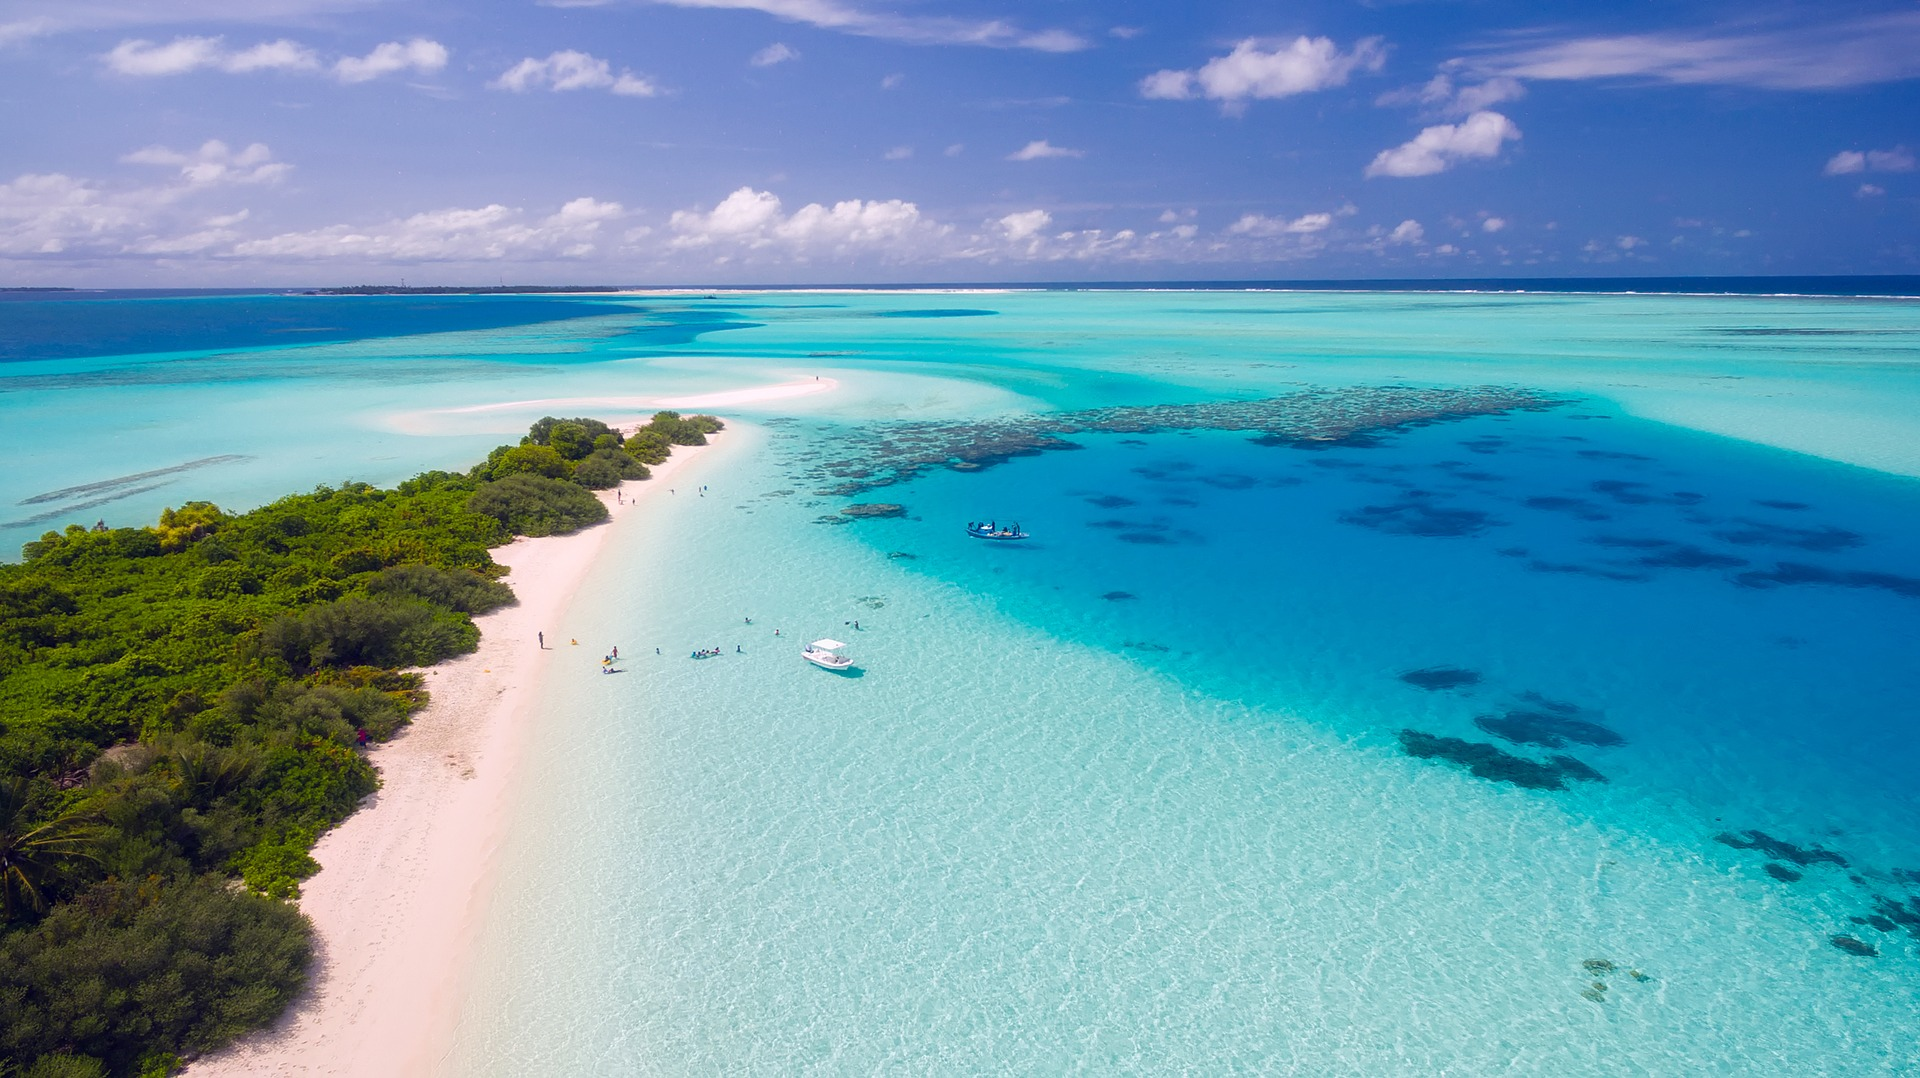 Travel blog: Experience the Maldives